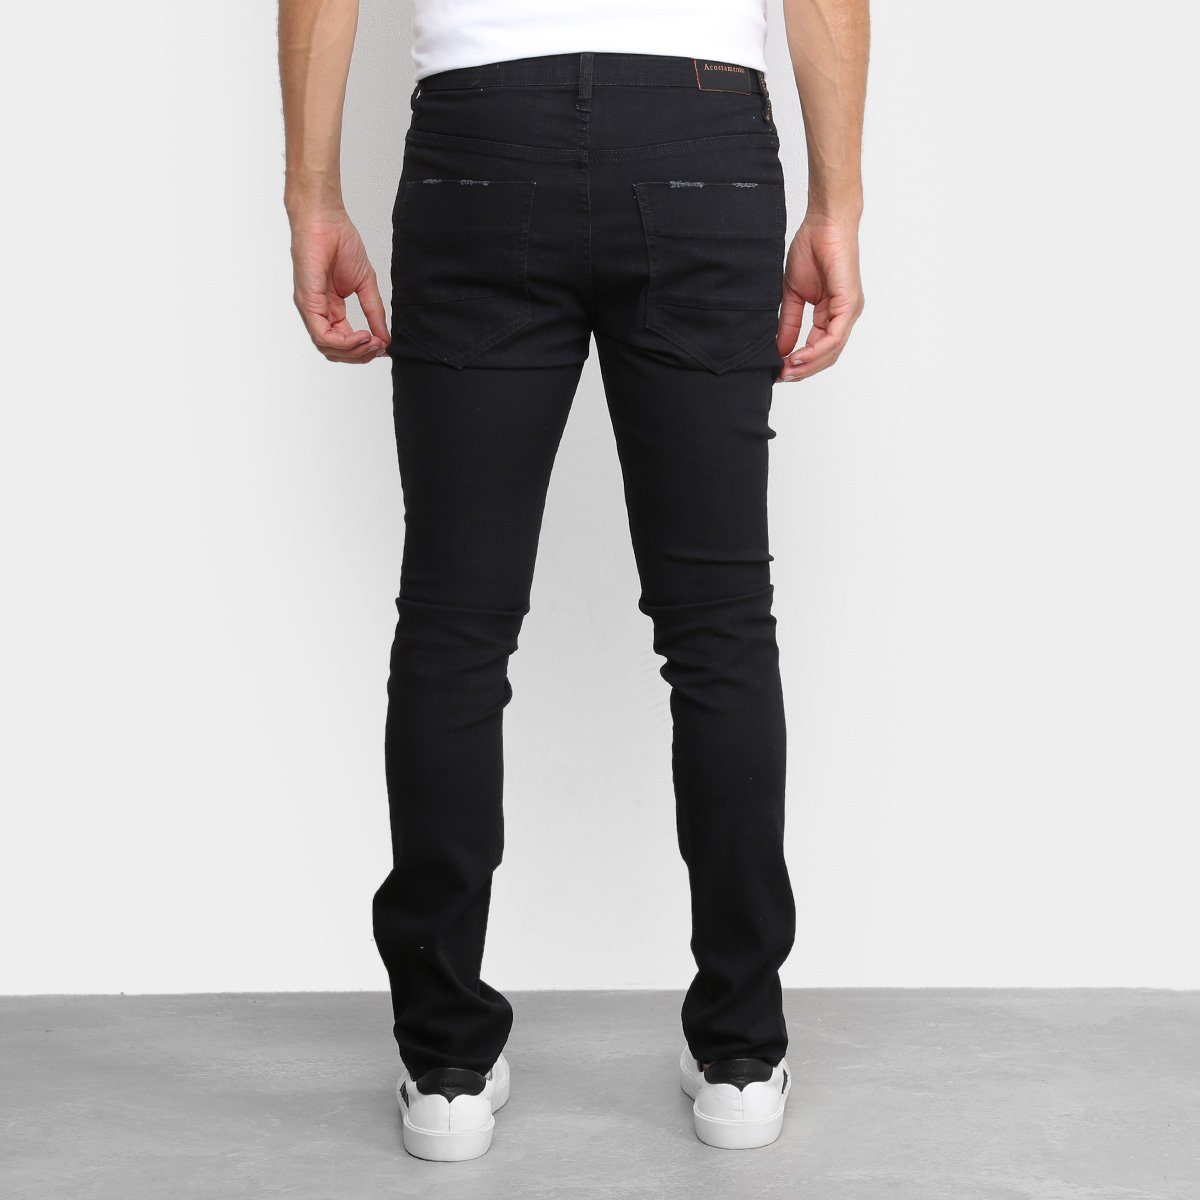 Calça Jeans Acostamento Skinny Masculina - Azul